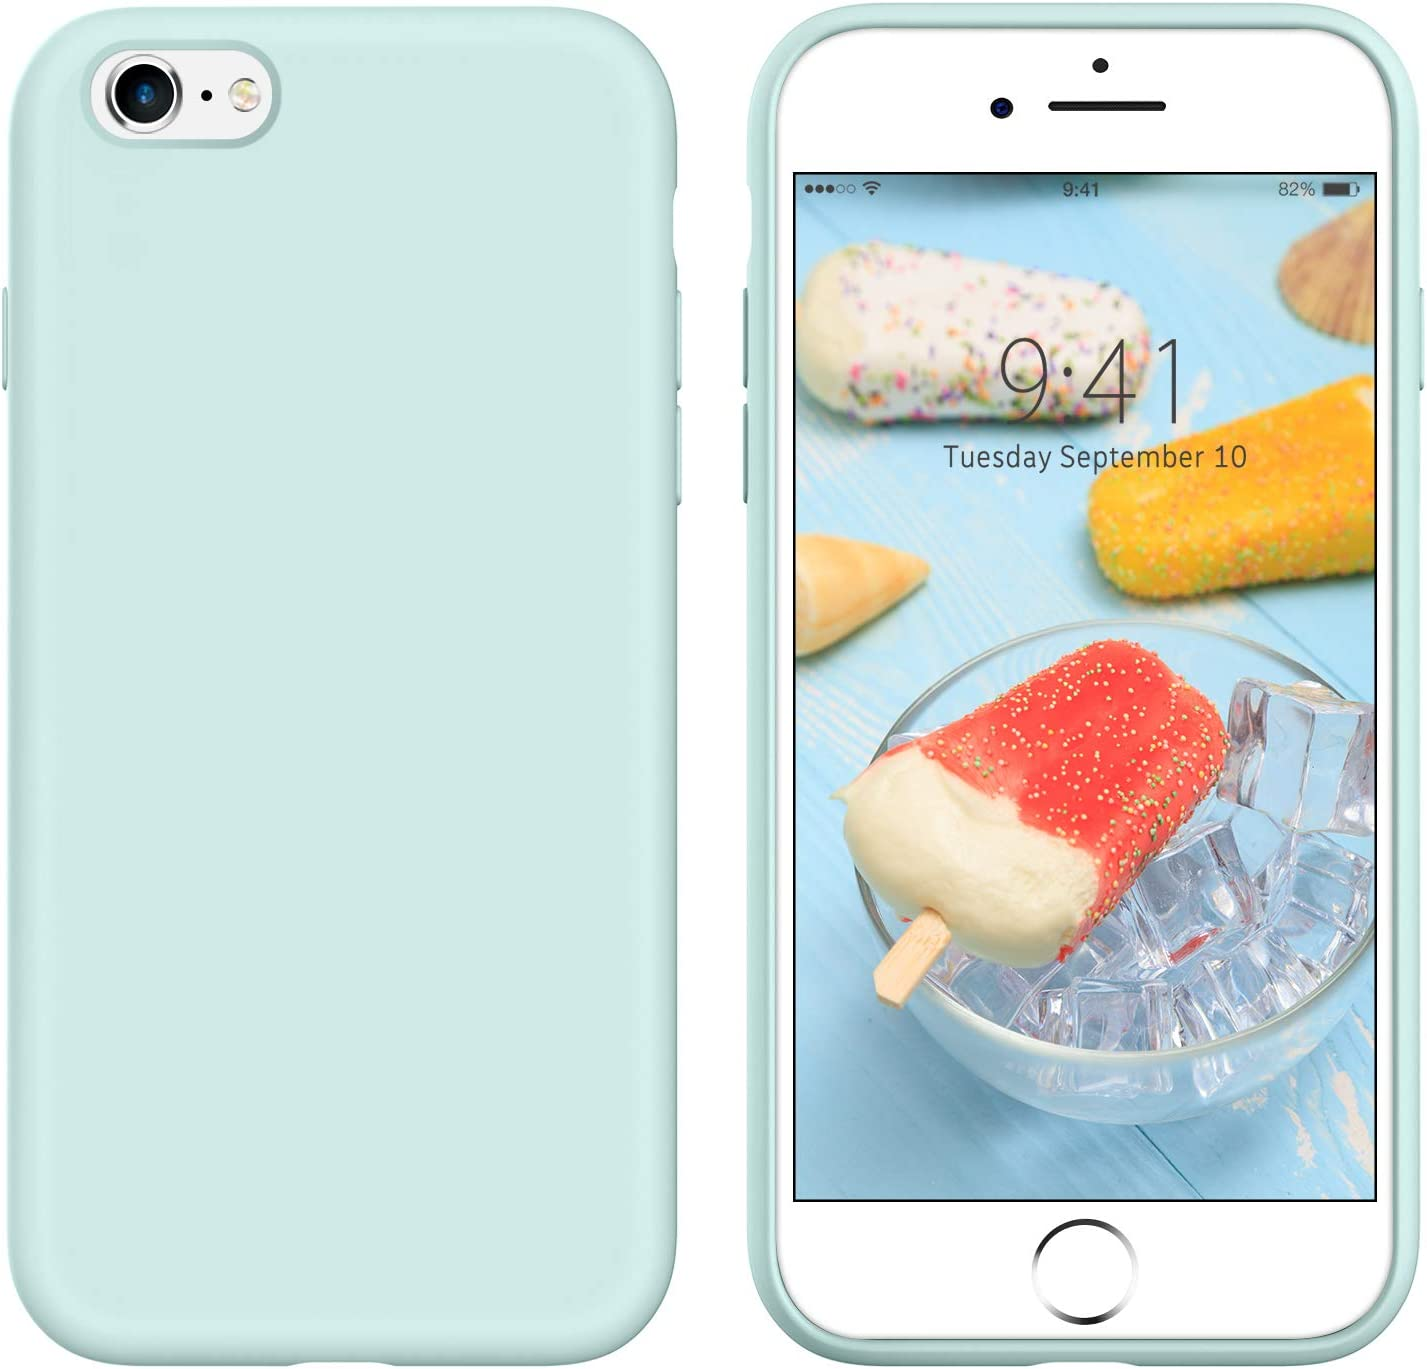 iPhone 6s Plus Case iPhone 6 Plus Case Liquid Silicone, GUAGUA Soft Gel Rubber Slim Lightweight Microfiber Lining Cushion Texture Shockproof Protective Phone Cases for iPhone 6 Plus/6s Plus Light Blue